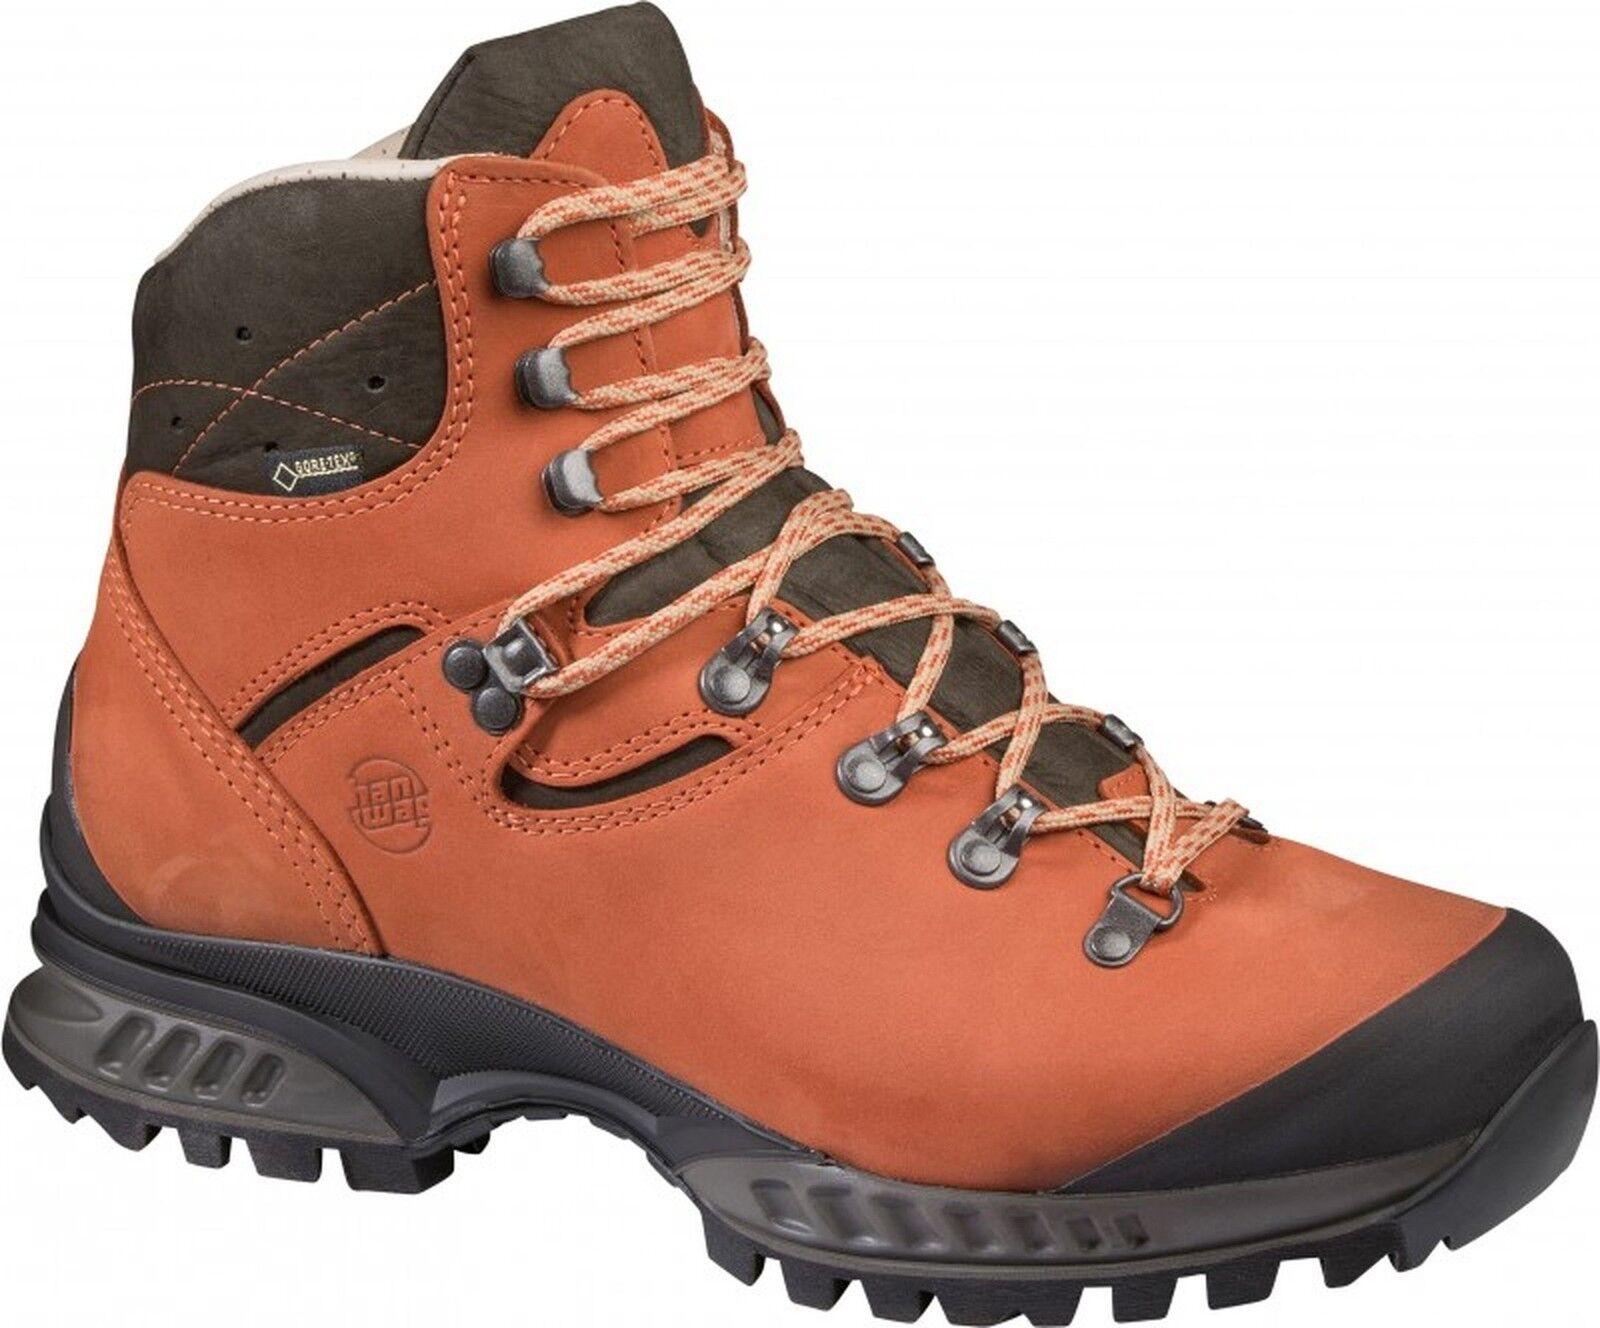 Casual salvaje Grandes zapatos con descuento Hanwag Bergschuhe: Tatra Lady GTX GORE-TEX Größe 5 - 38 autumn leaf